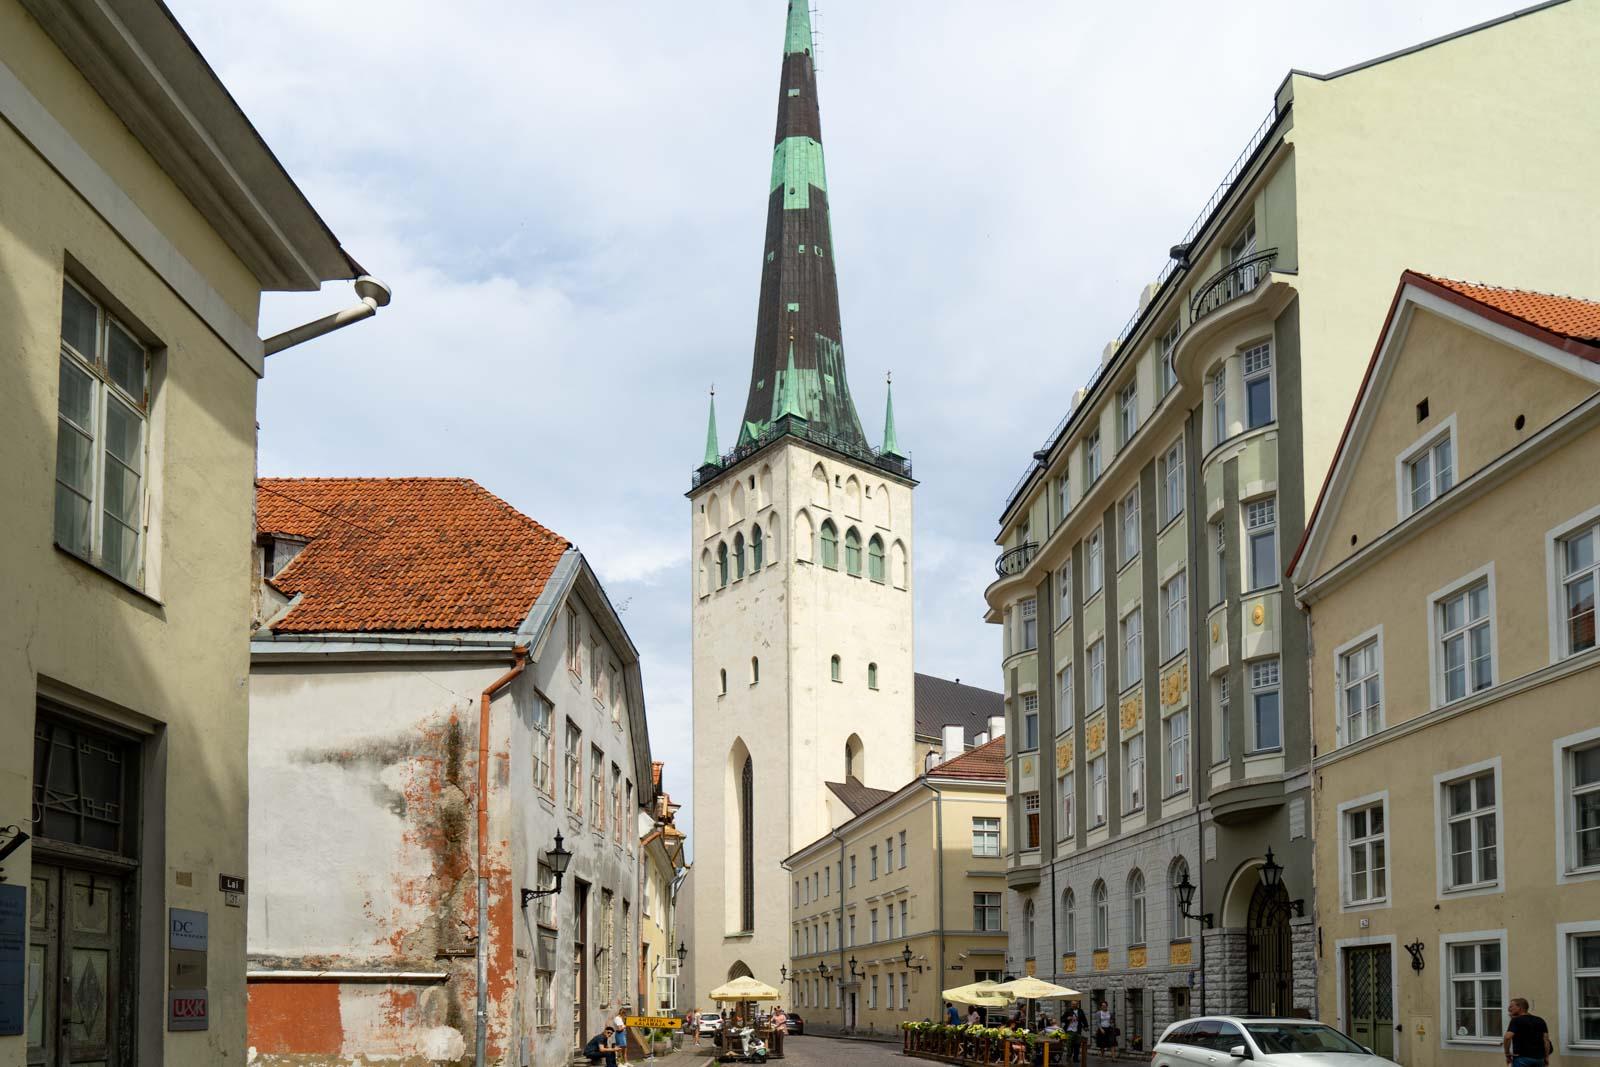 St Olaf's church, Tallinn, Estonia